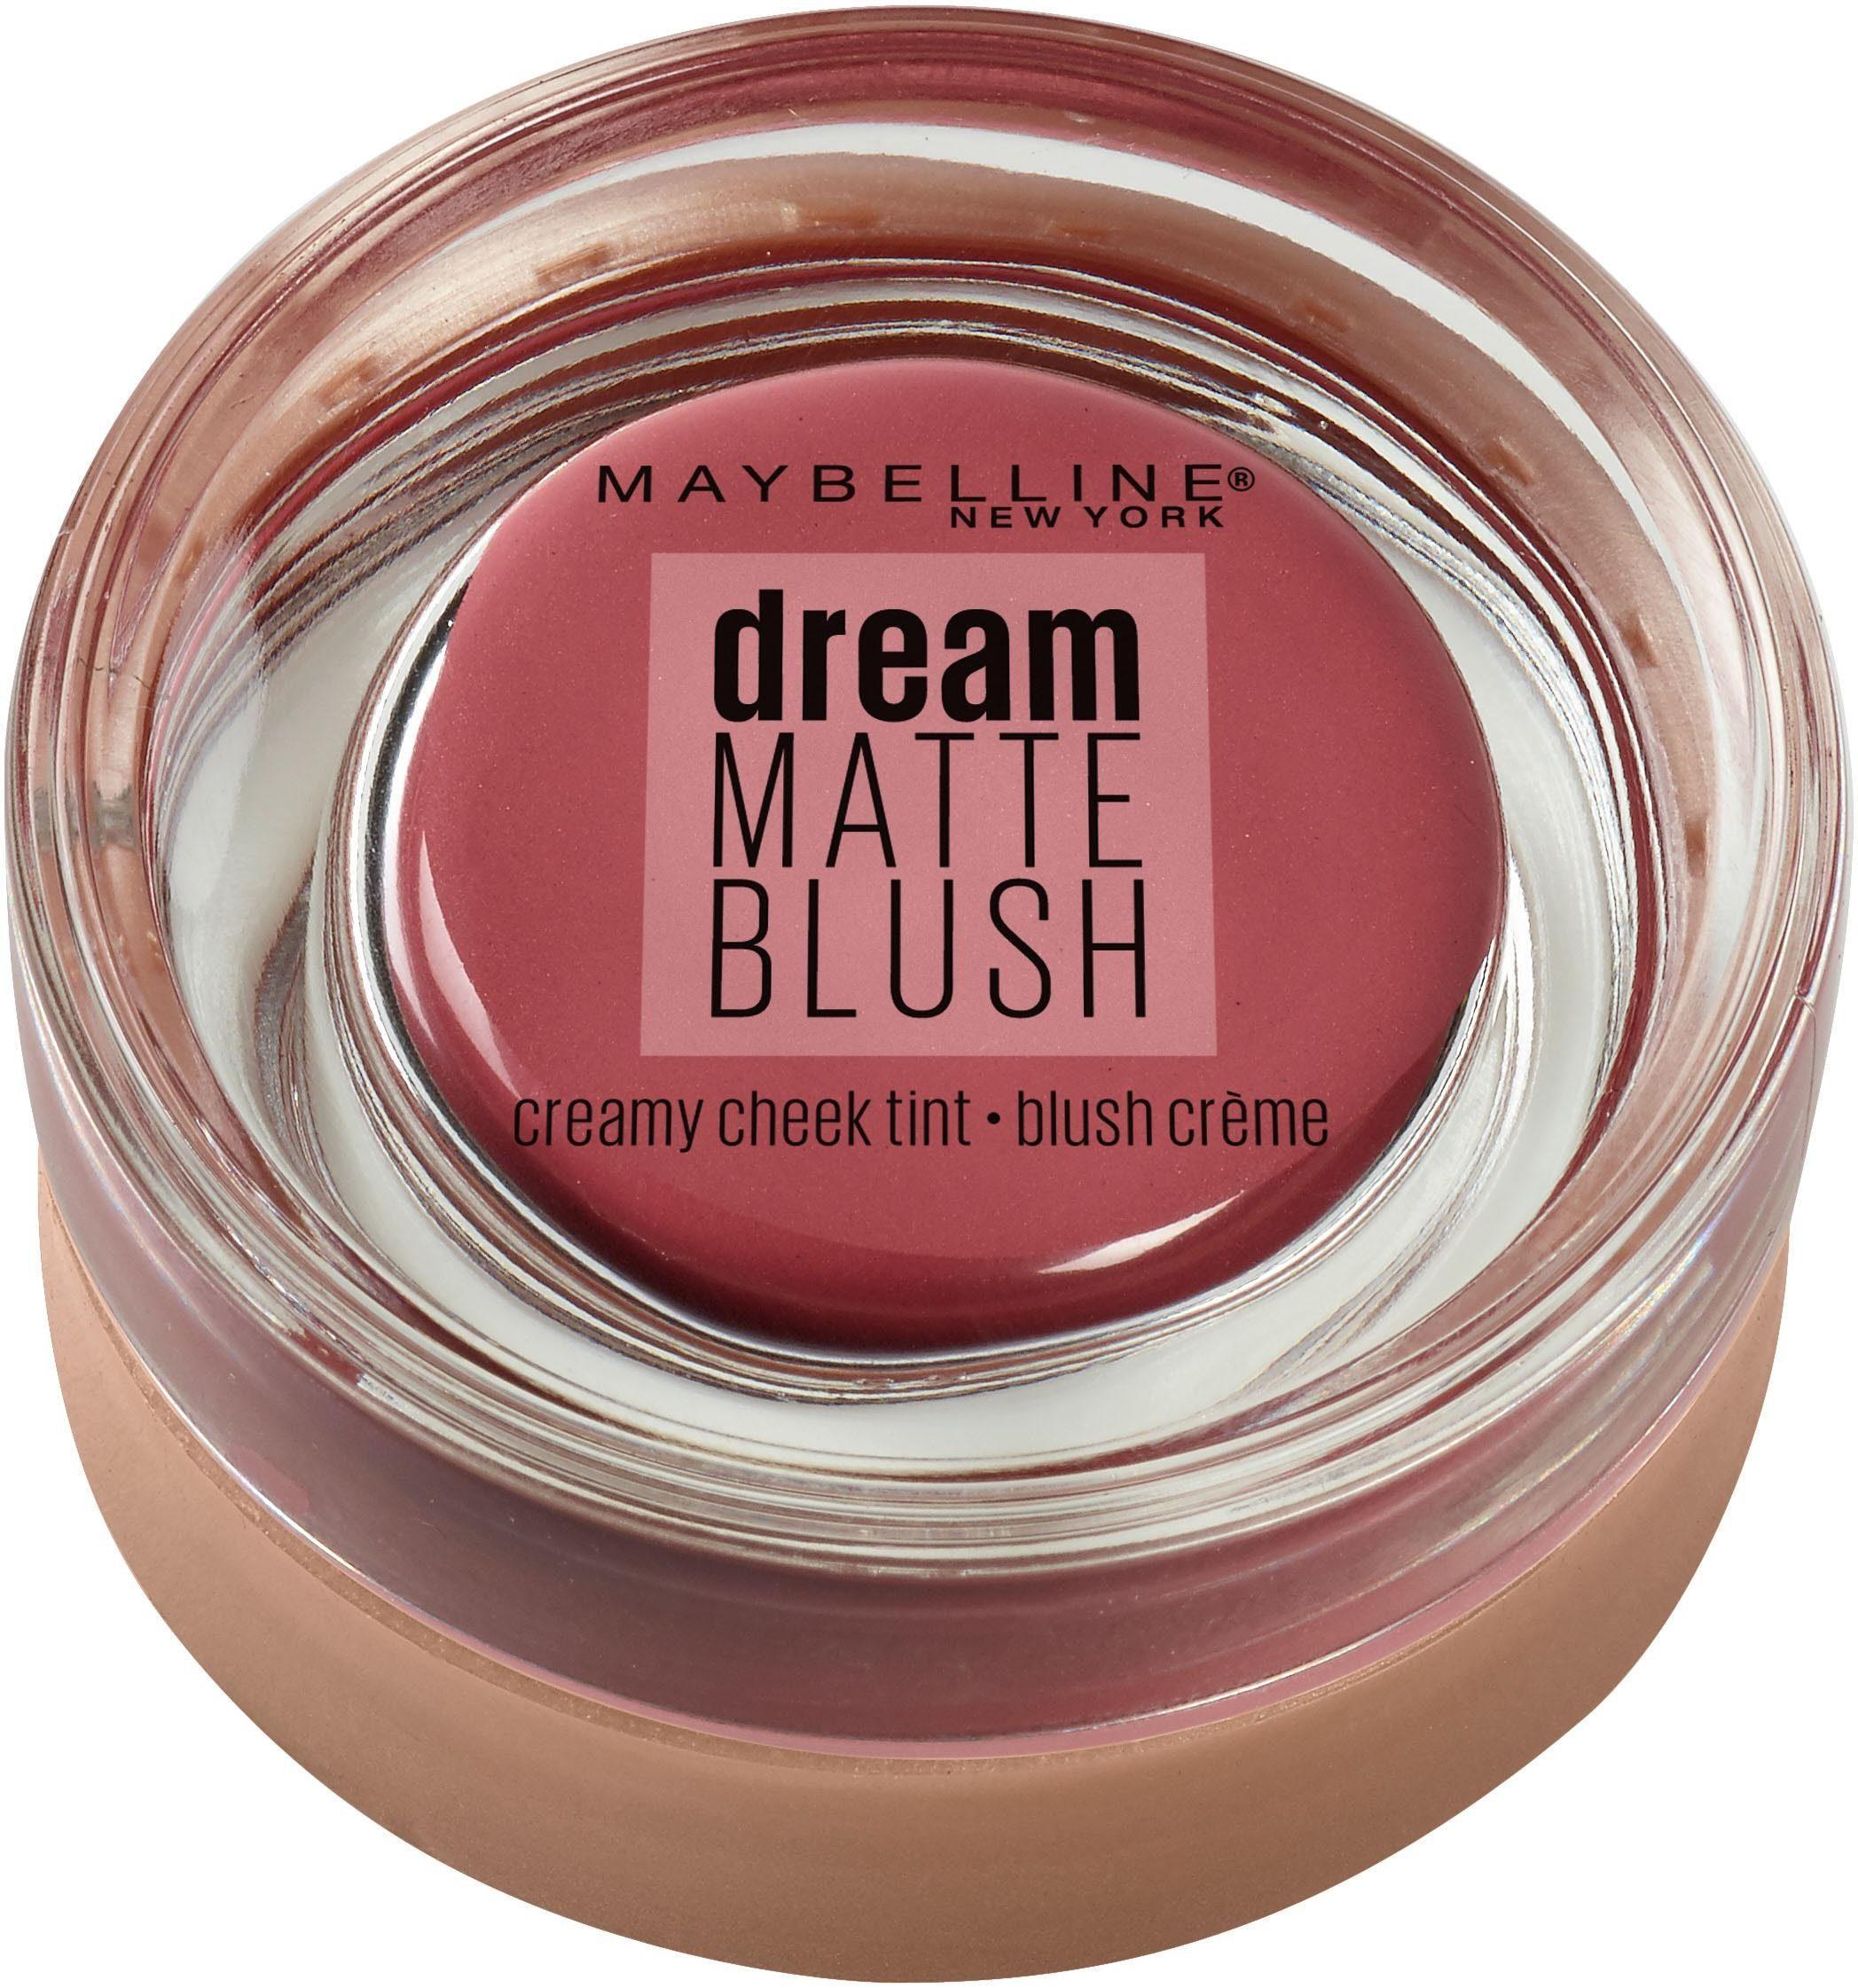 MAYBELLINE NEW YORK Rouge »Dream Matte Blush«